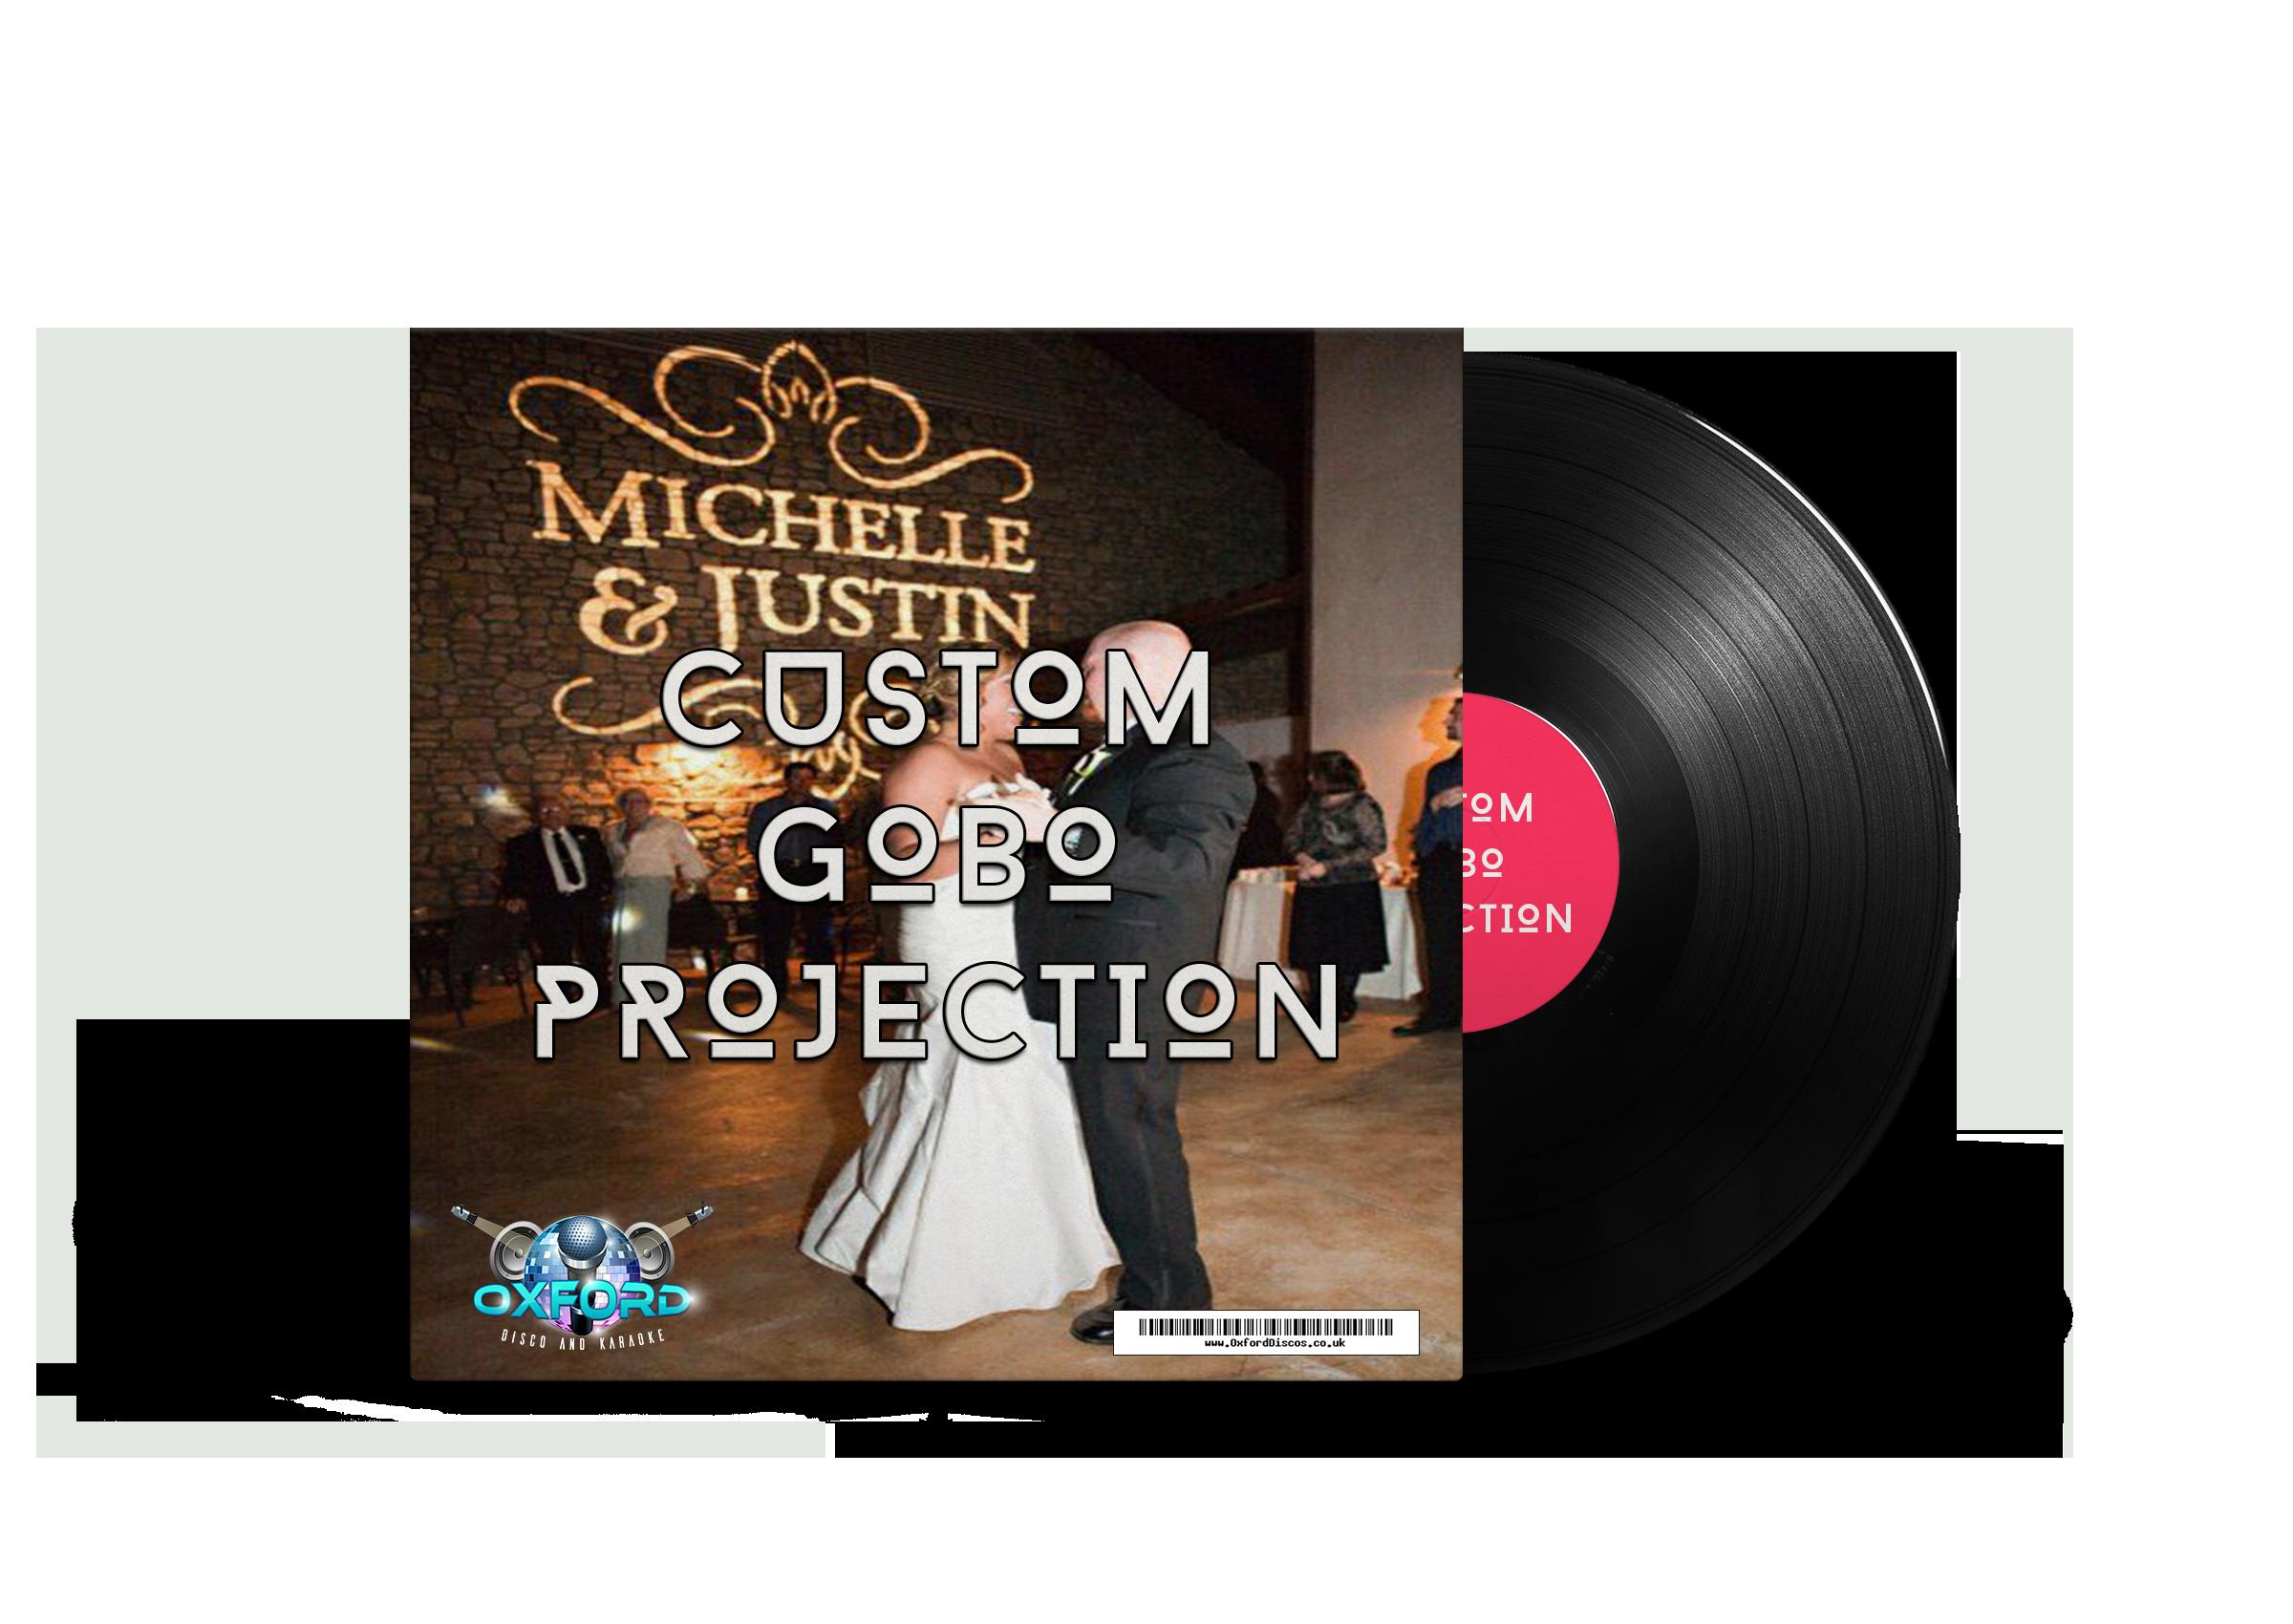 Oxford Disco and Karaoke Custom Gobo Projection